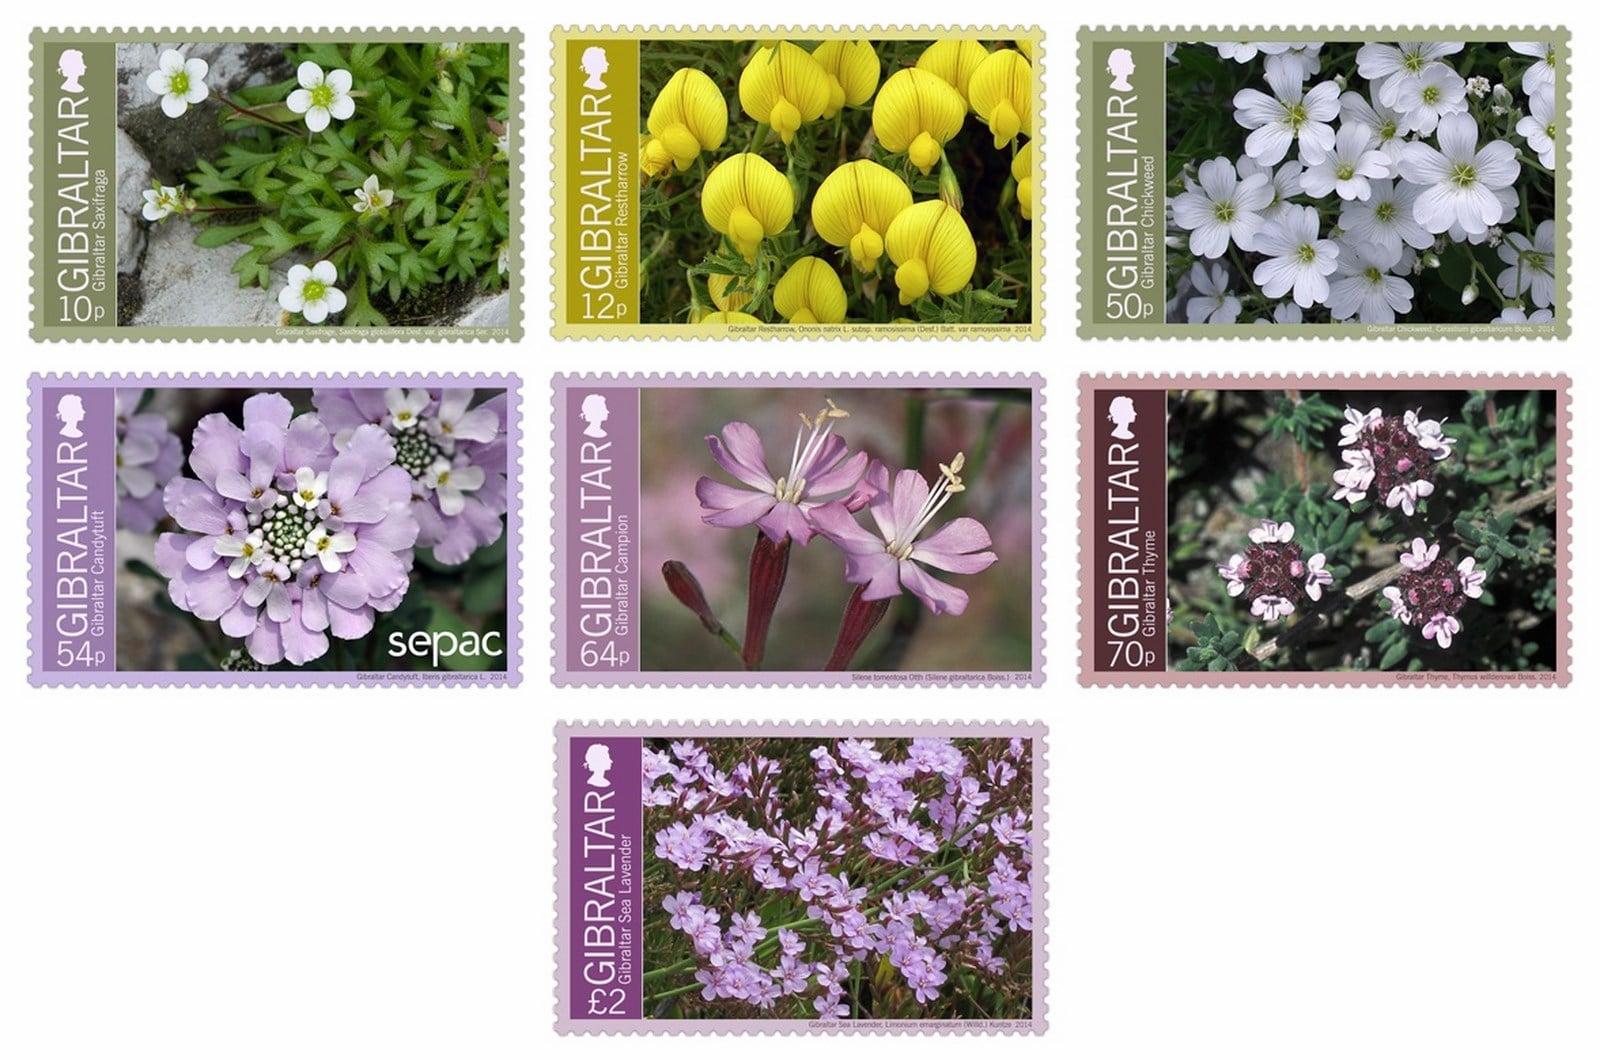 2014-Endemic-2014-Flowers